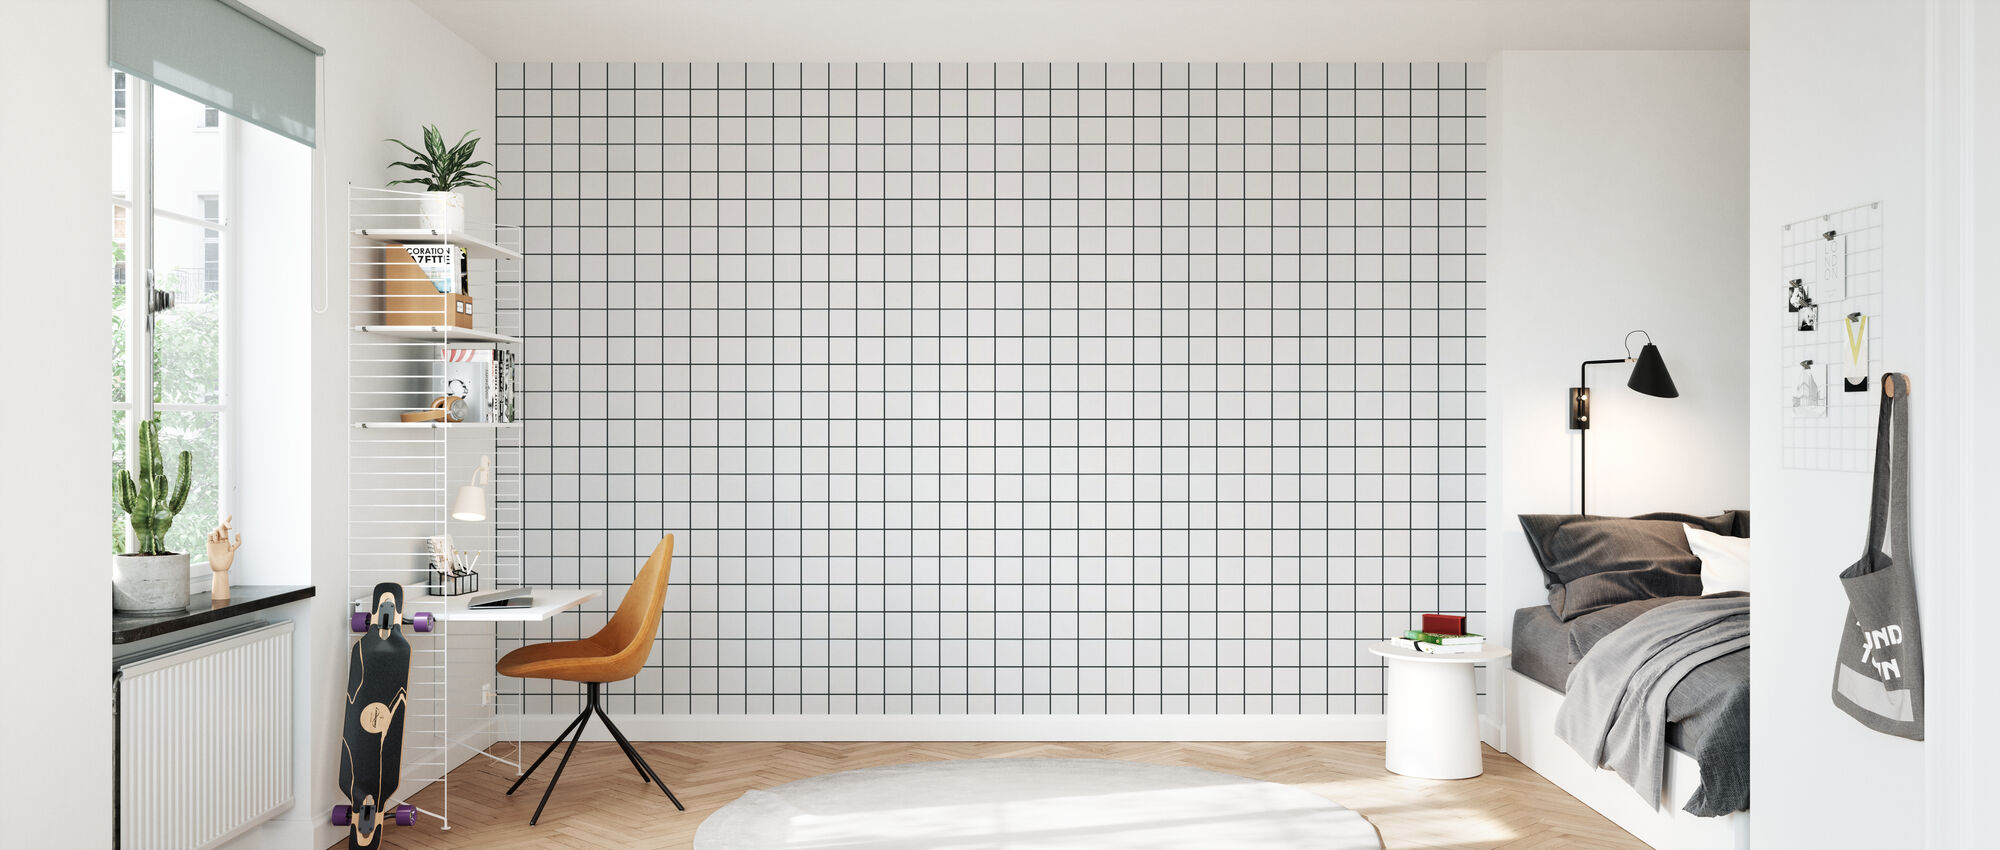 White Ceramic Tiles - 10x10 Antracit Seam - Wallpaper - Kids Room